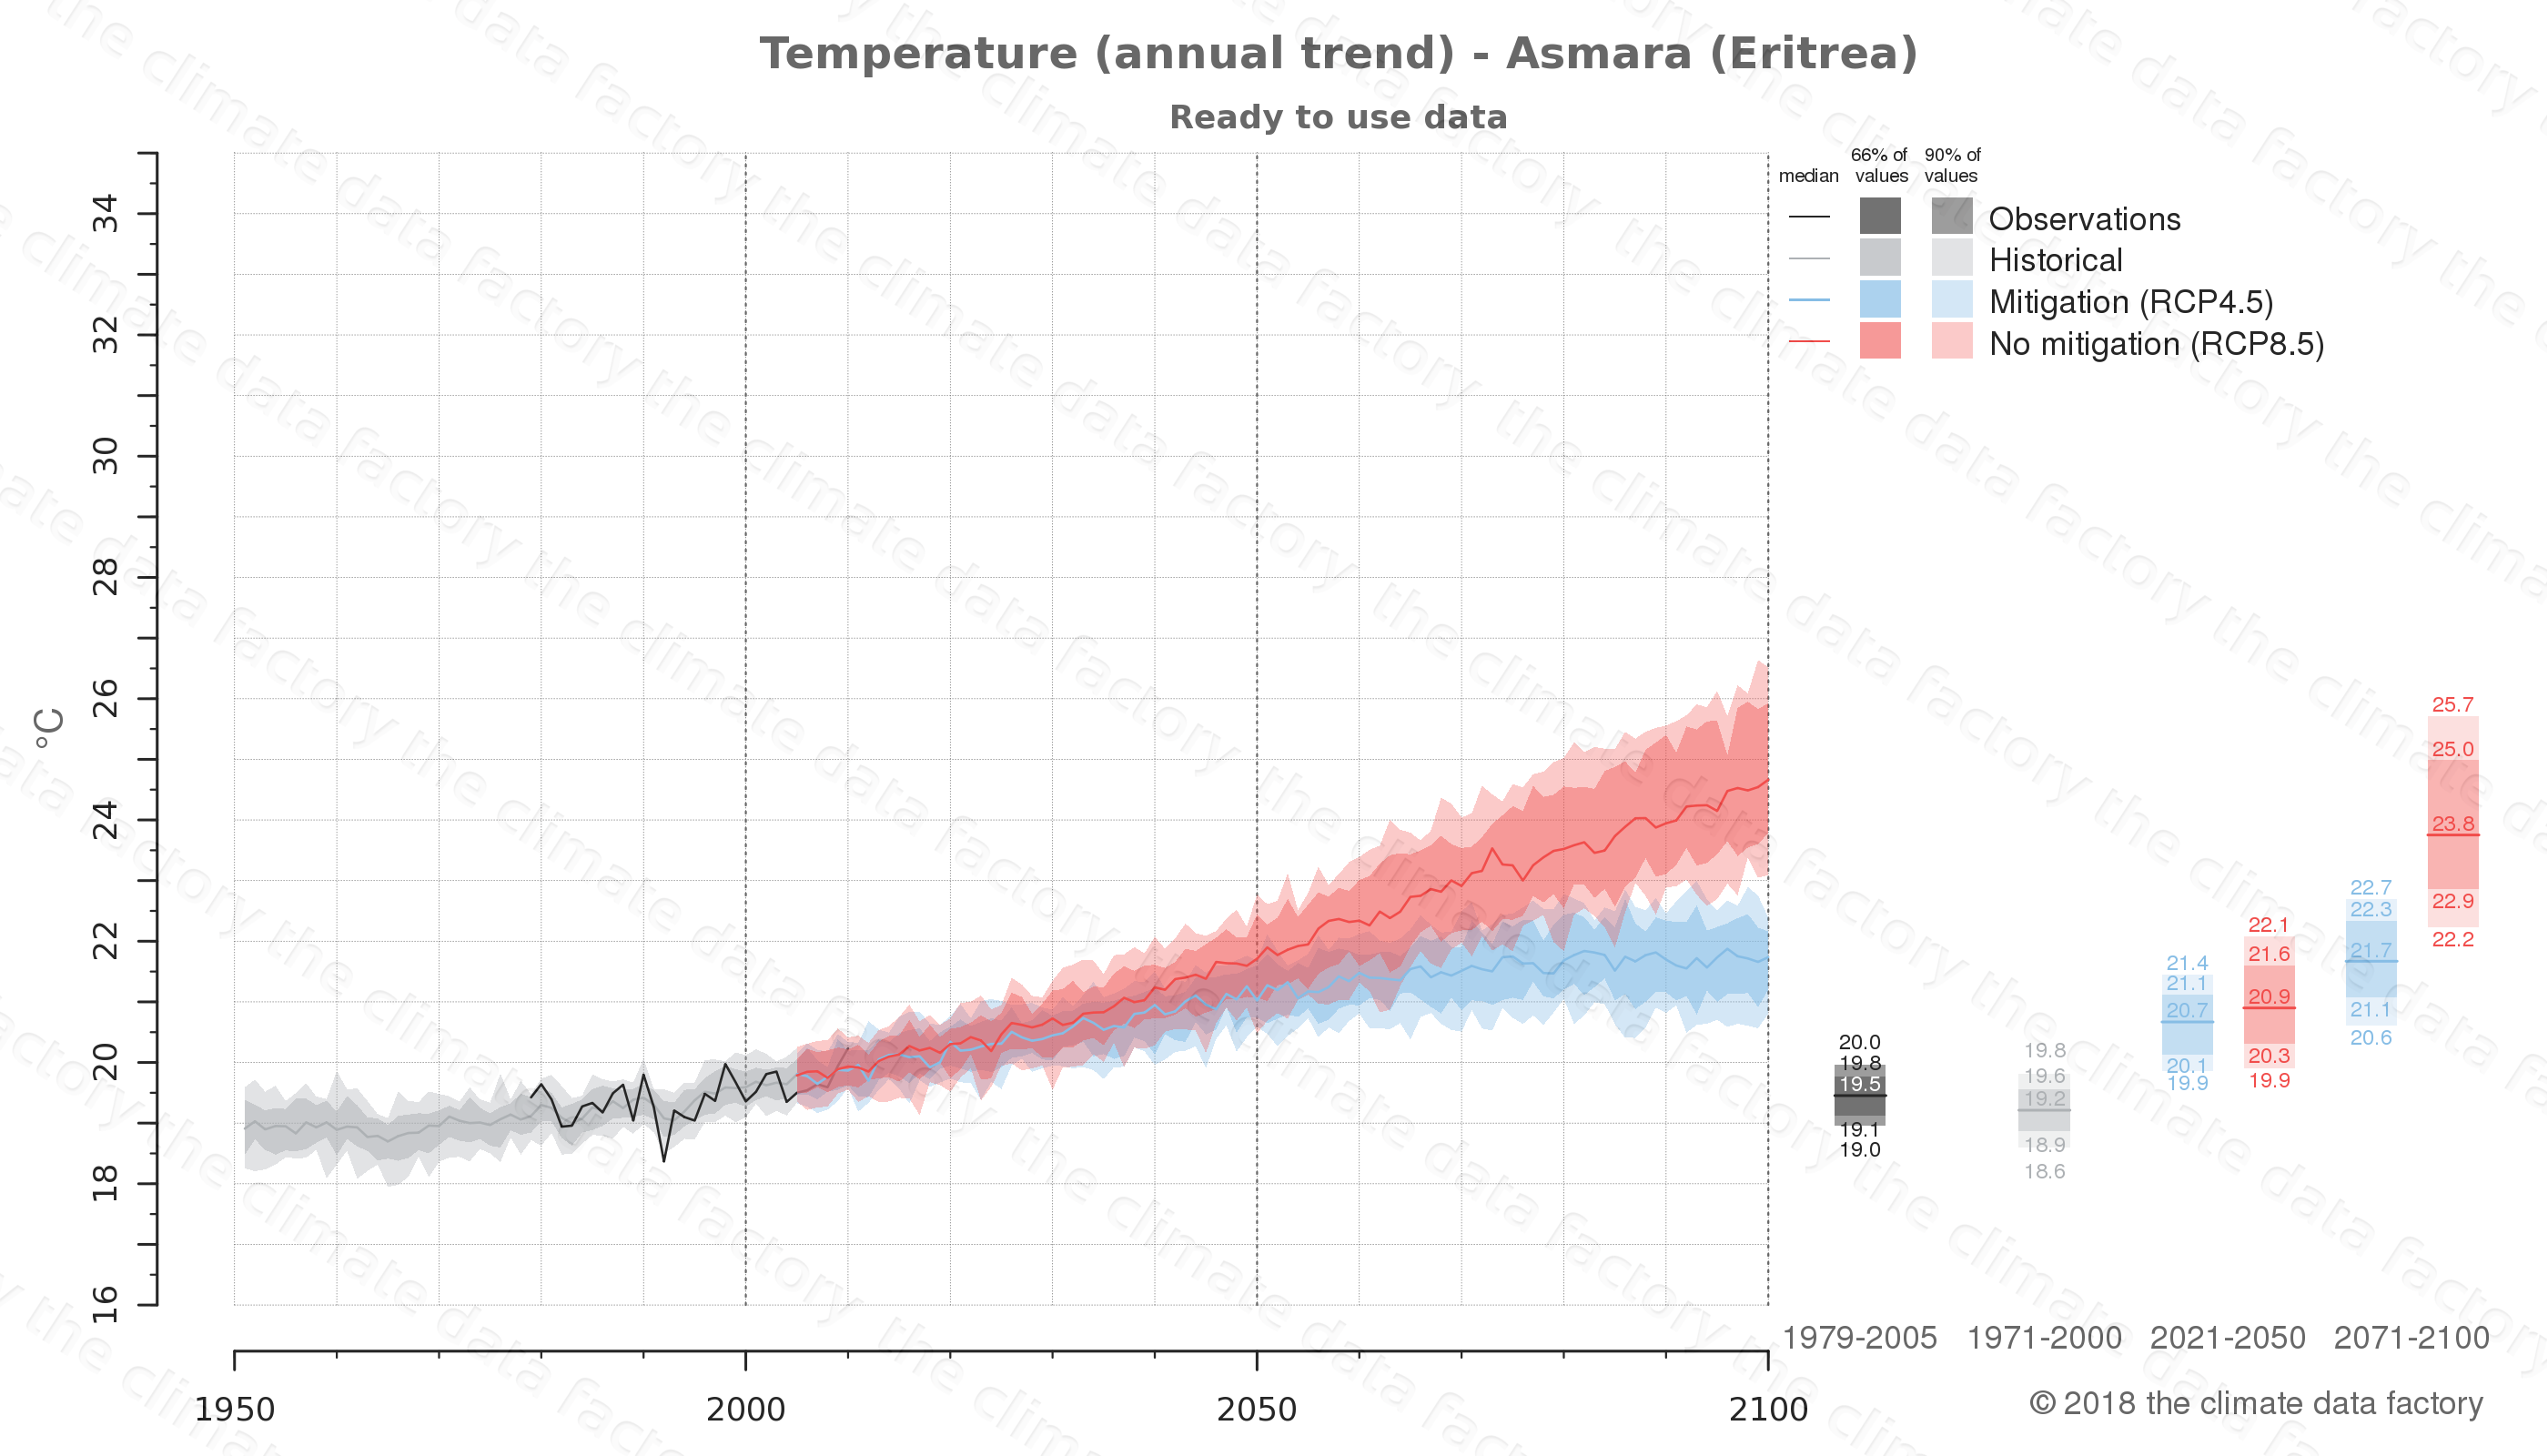 climate change data policy adaptation climate graph city data temperature asmara eritrea